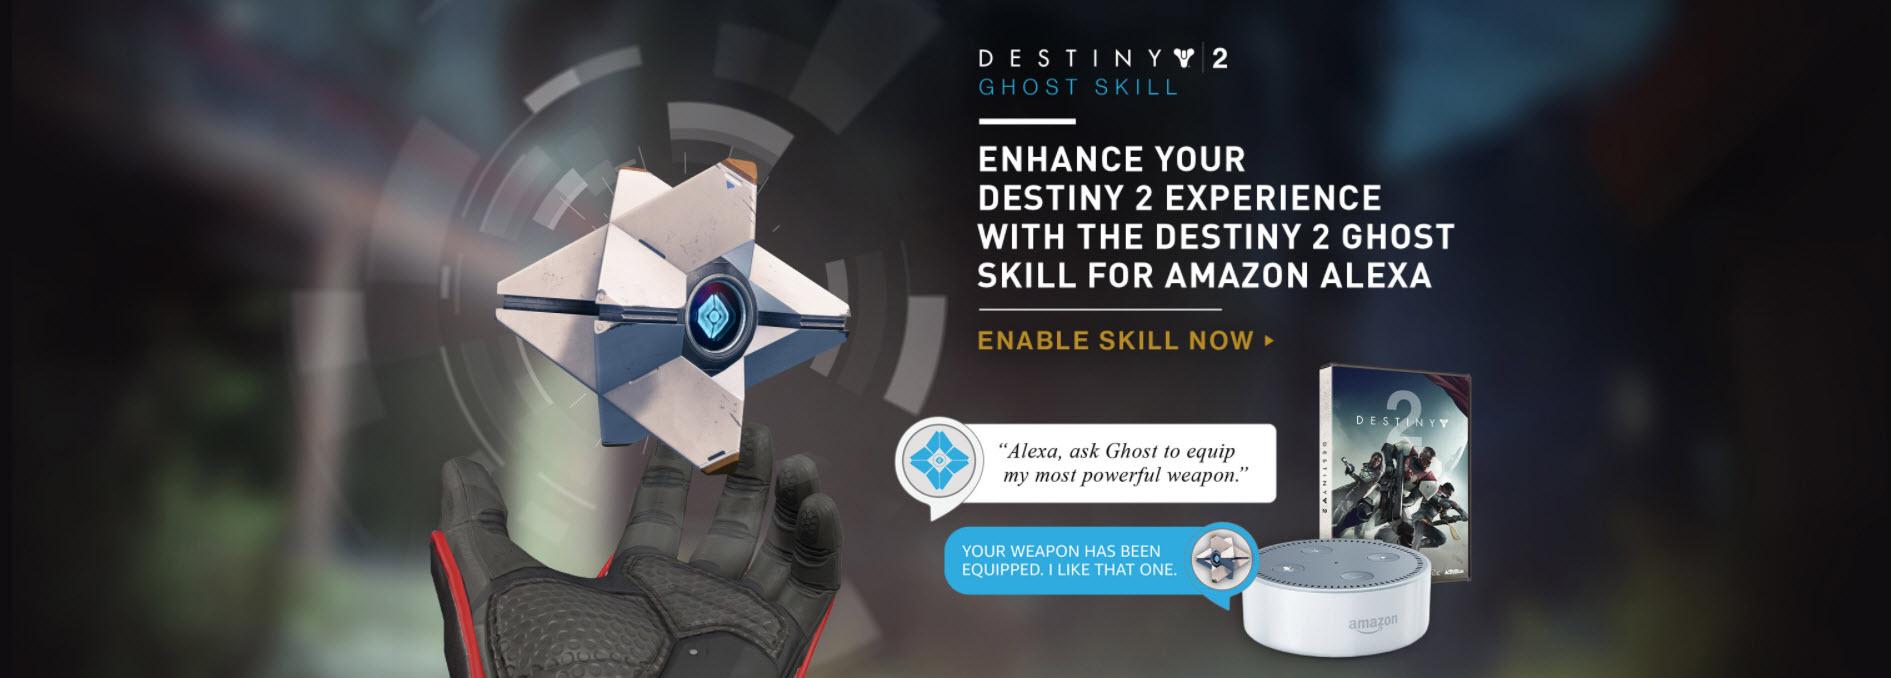 destiny 2 skill